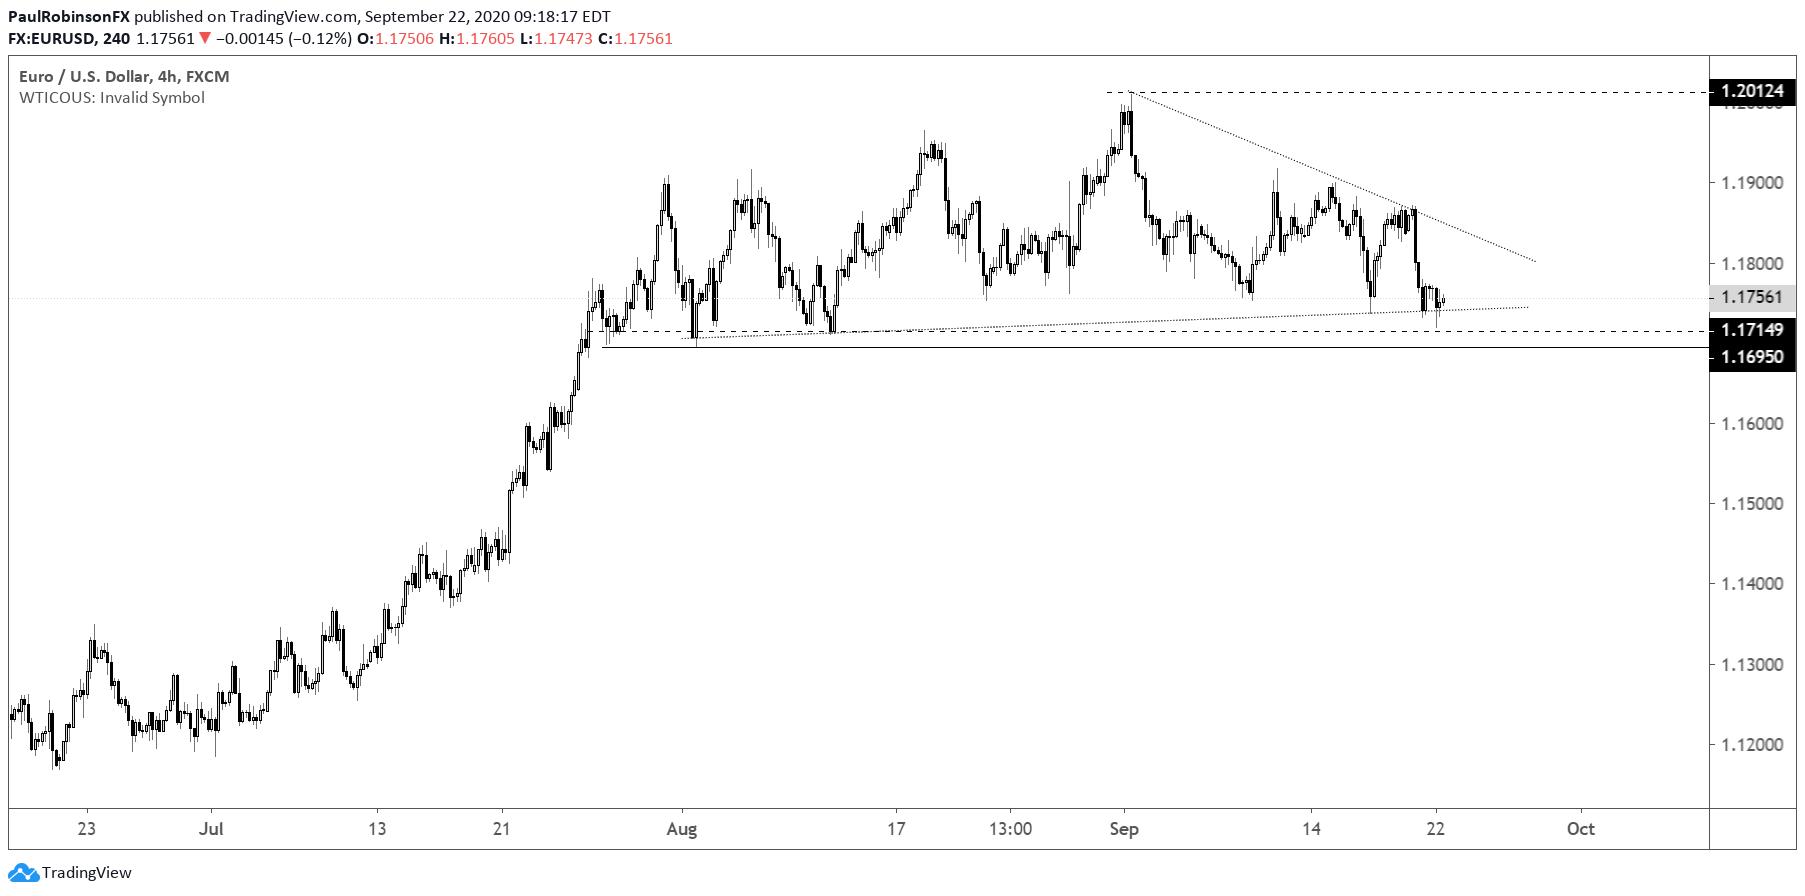 Aud usd chart live forex room molangoane investment growth